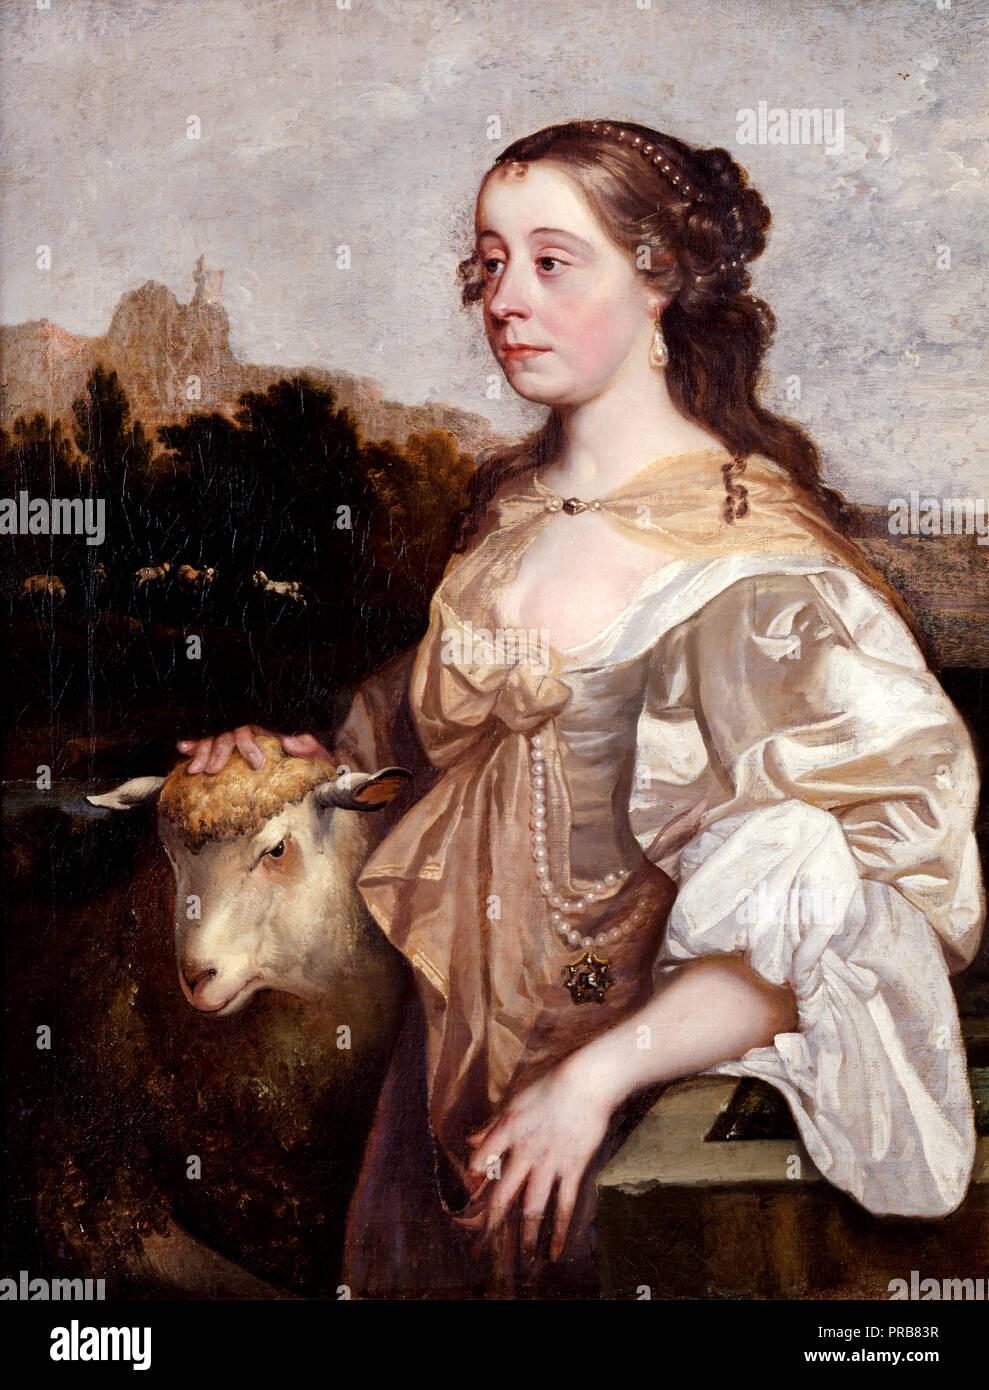 John Greenhill, una señora como pastora, circa 1665 Óleo sobre lienzo, Dulwich Picture Gallery, Londres, Inglaterra. Imagen De Stock